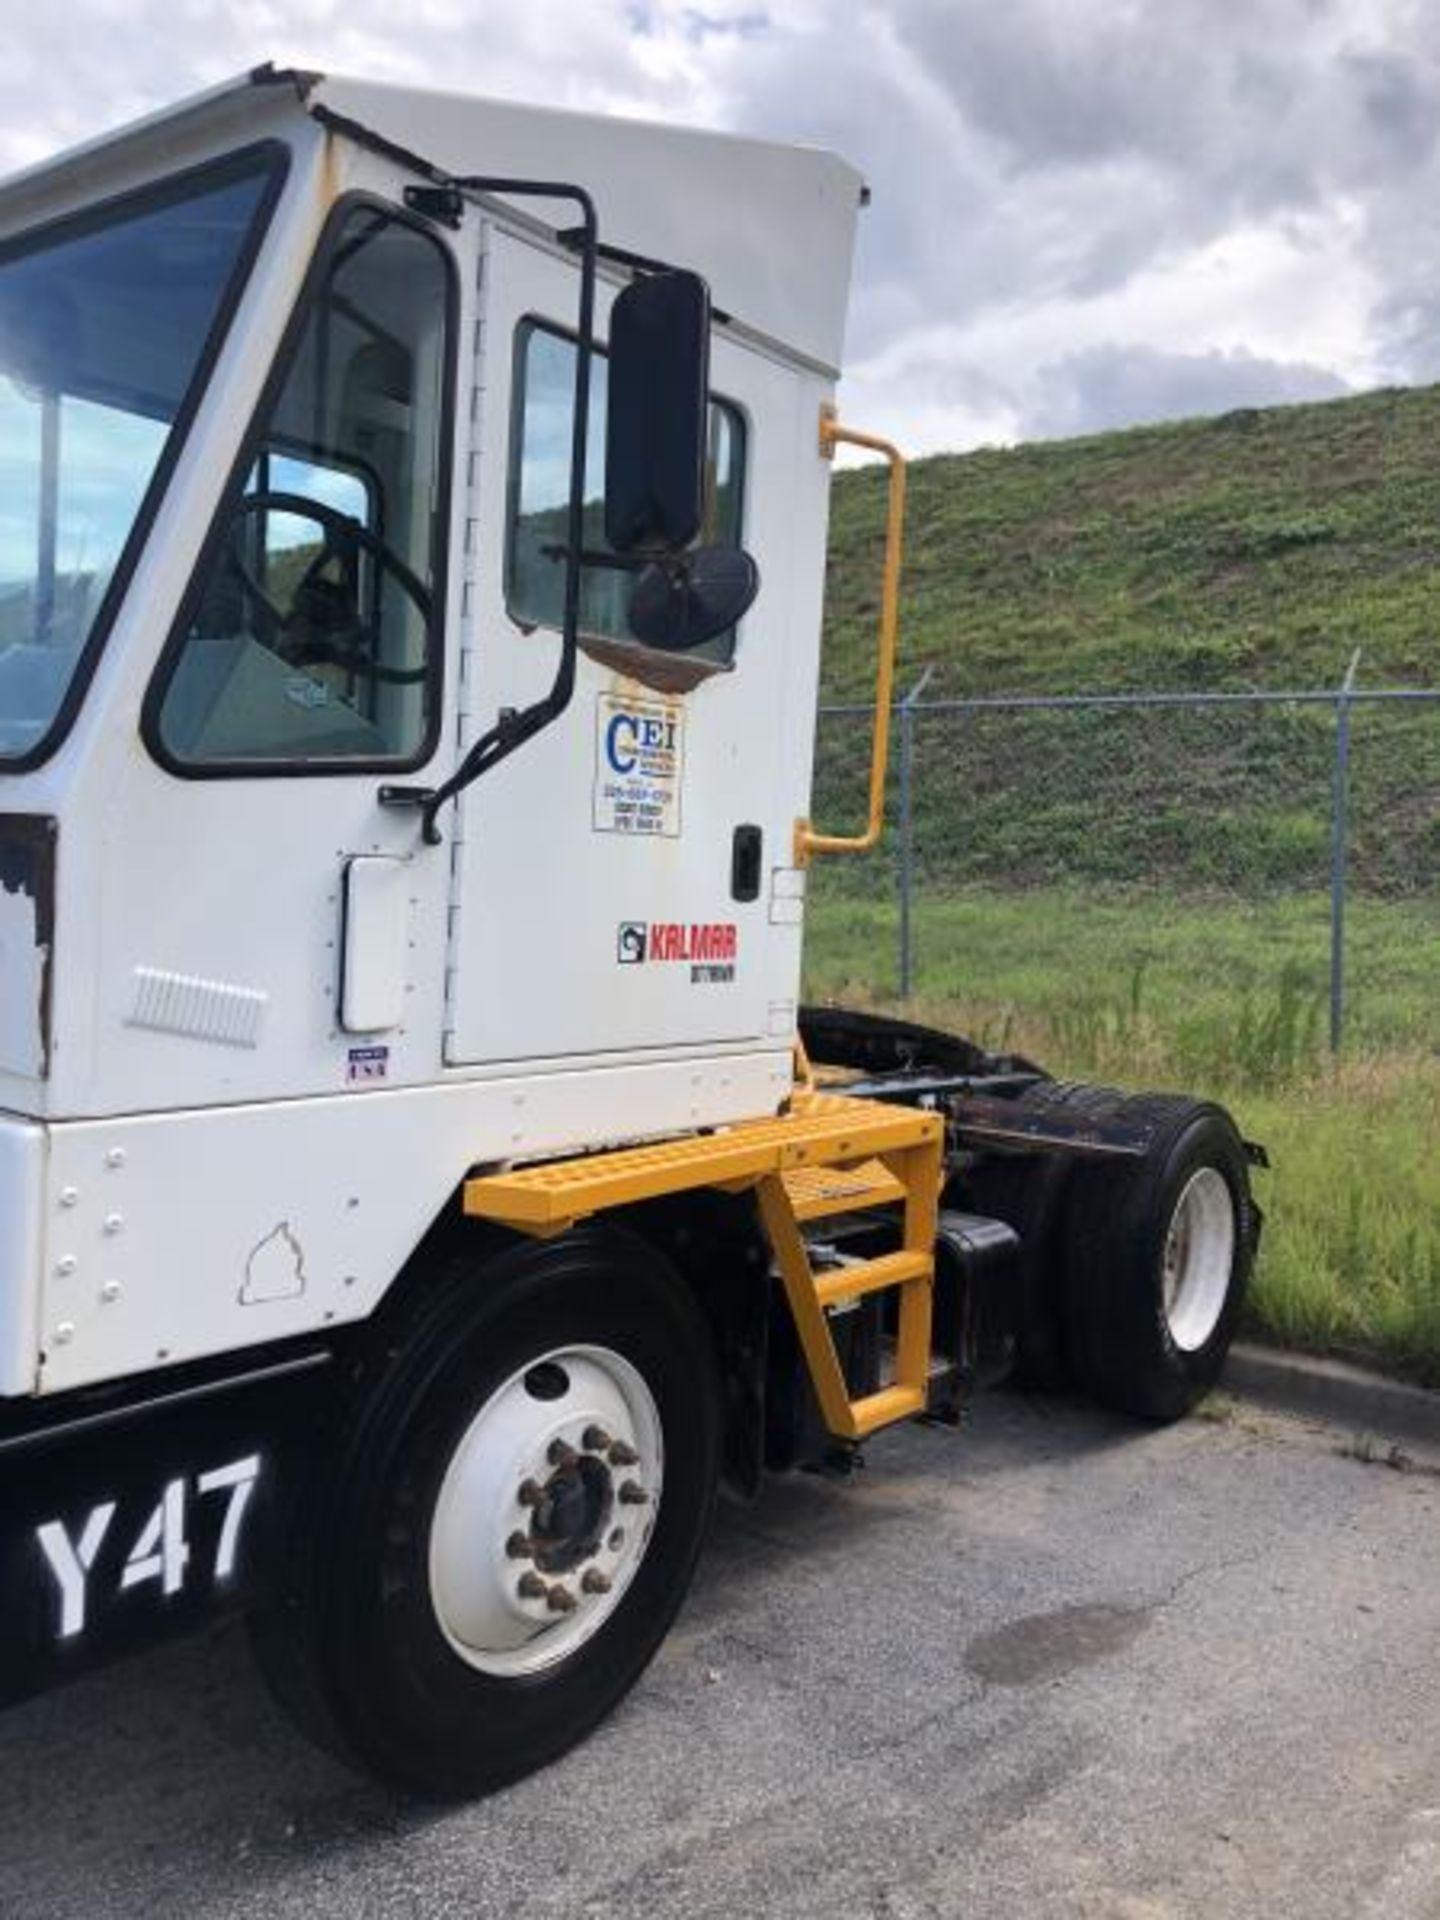 2015 Kalmar Ottawa 4x2 Yard Truck , SN: 338841 4,267.2 Hours, 1,683 Miles - Image 4 of 34